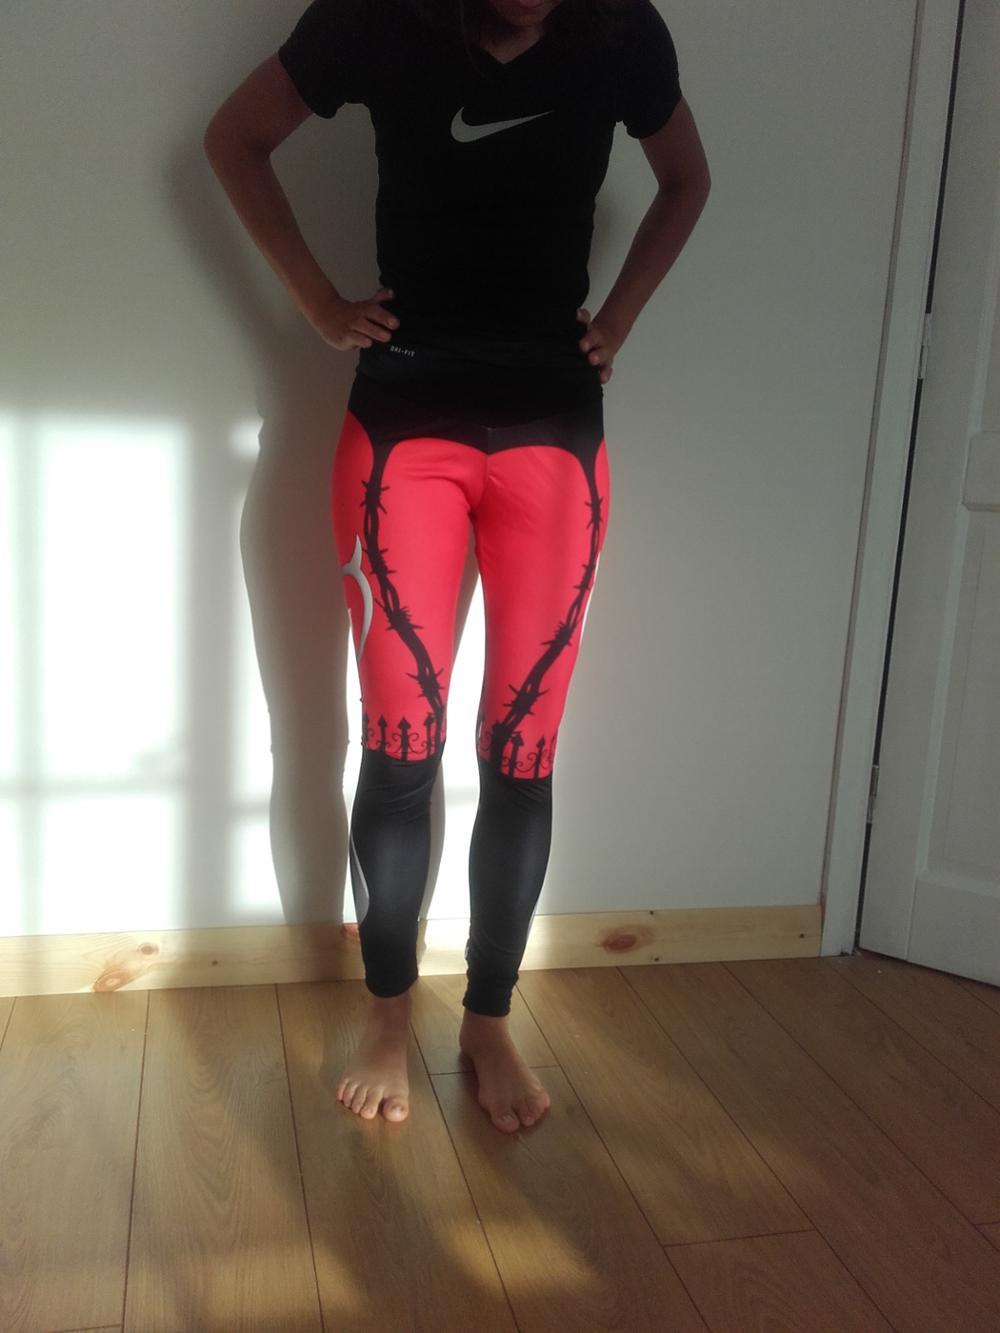 951d2a8335bdf Heart Printed Yoga Pants | Sexy Sportswear • Brawny Line